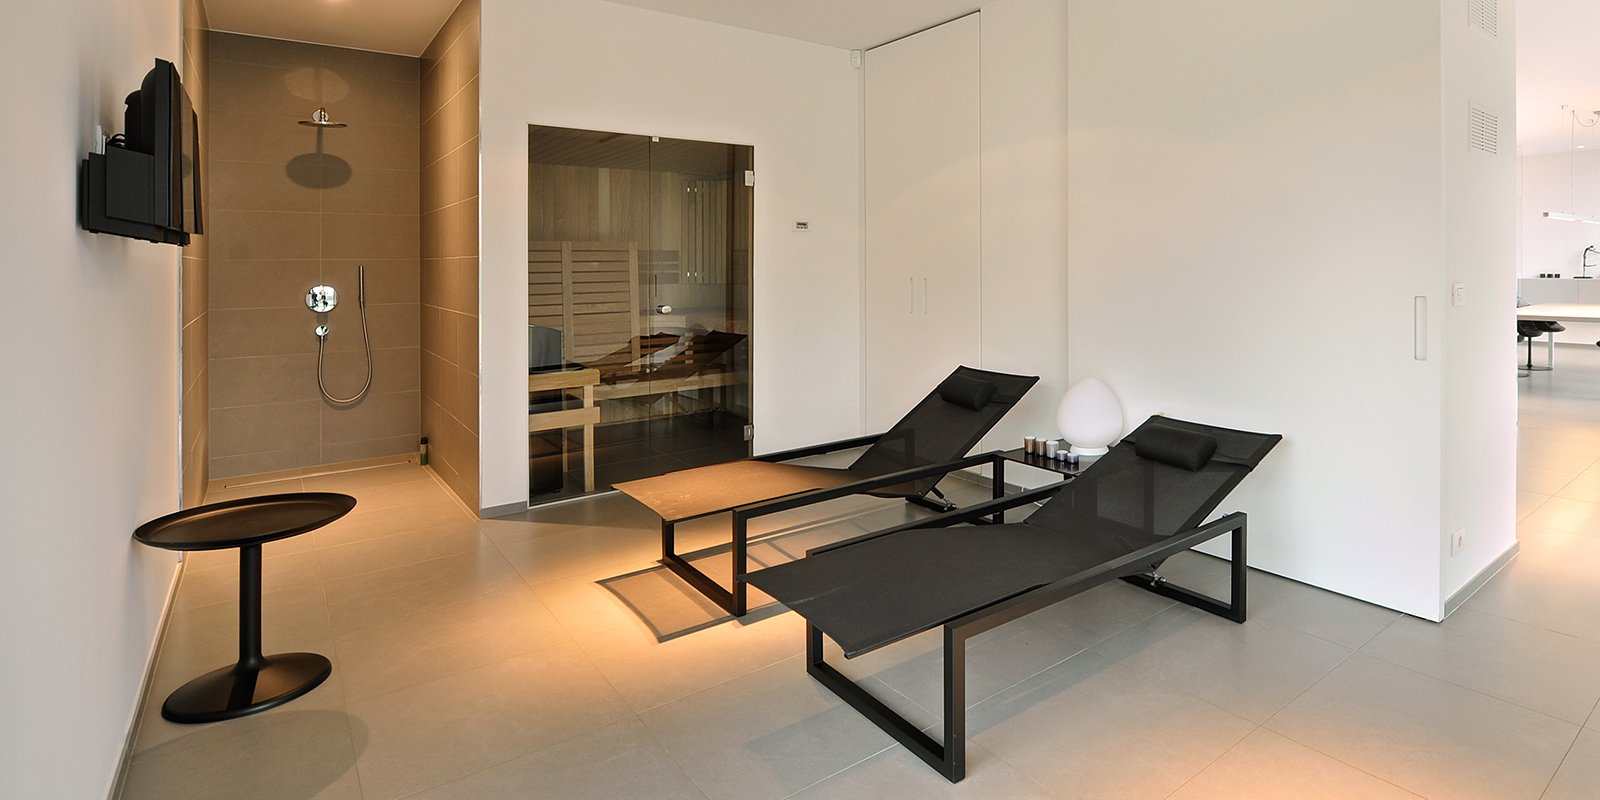 Strakke Witte Eettafel.Sfeervolle Keuken Achterwand Architects In Motion The Art Of